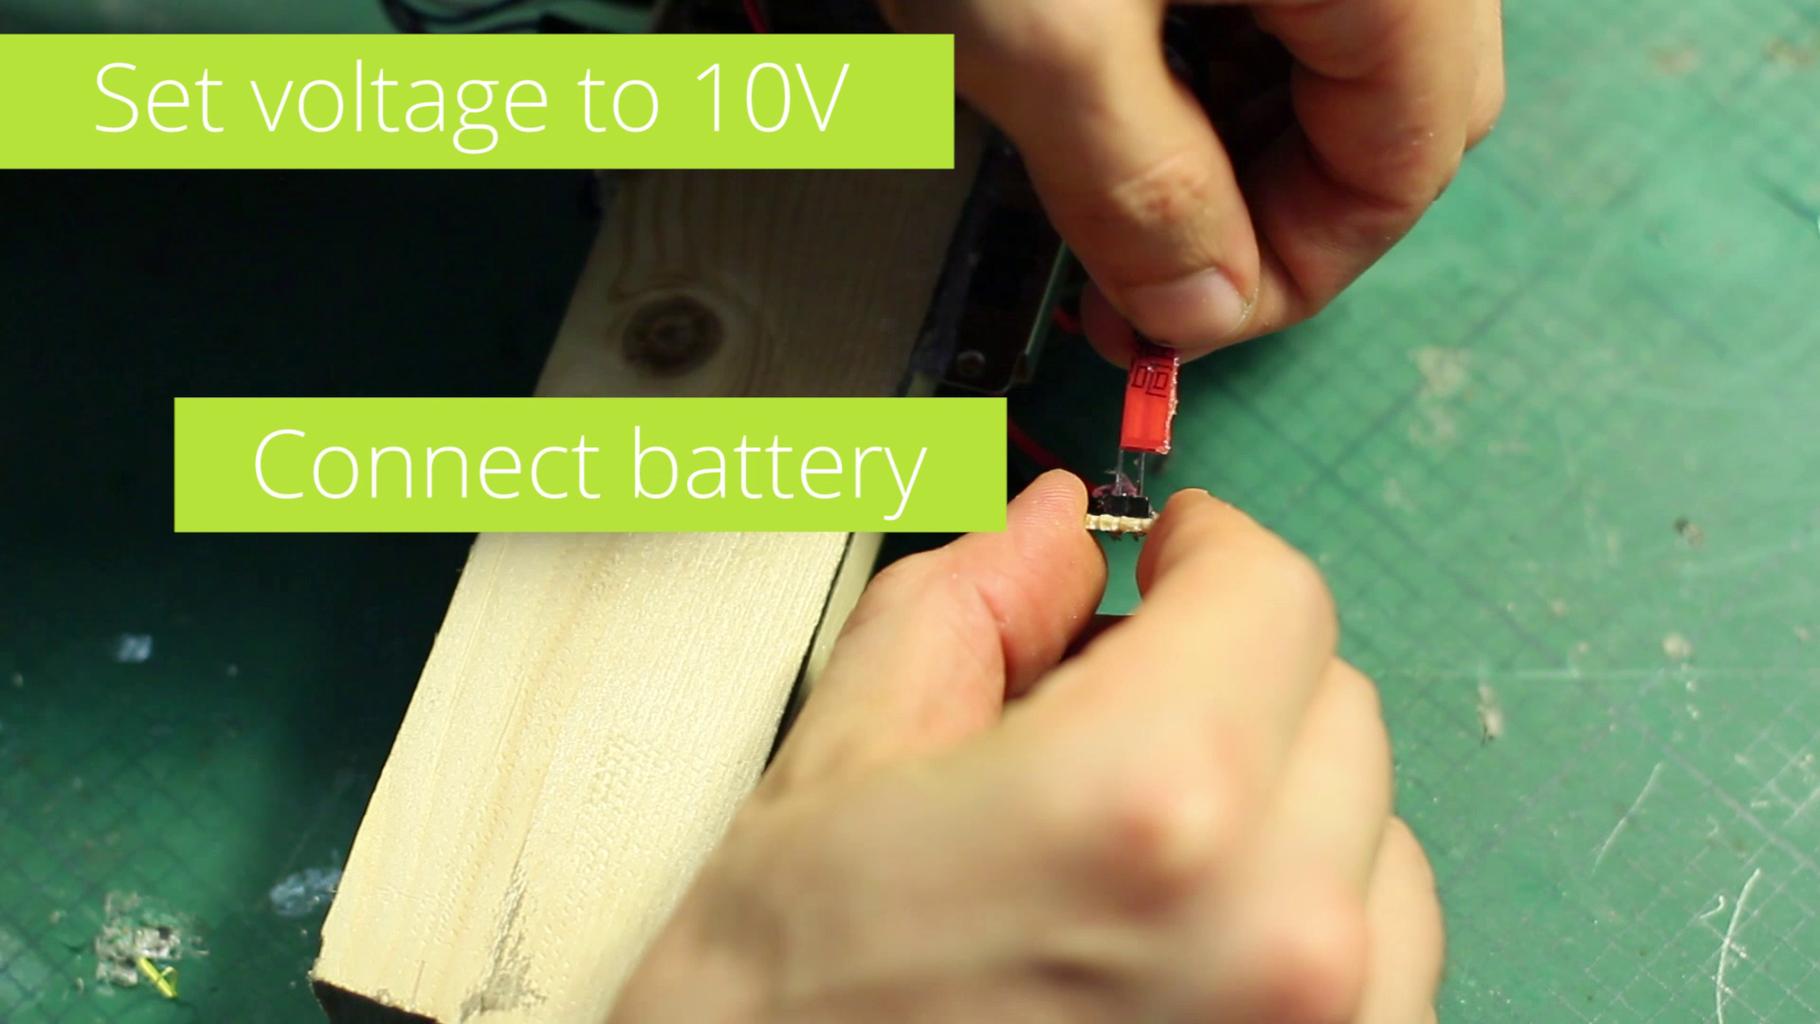 Set the Voltage to 10V